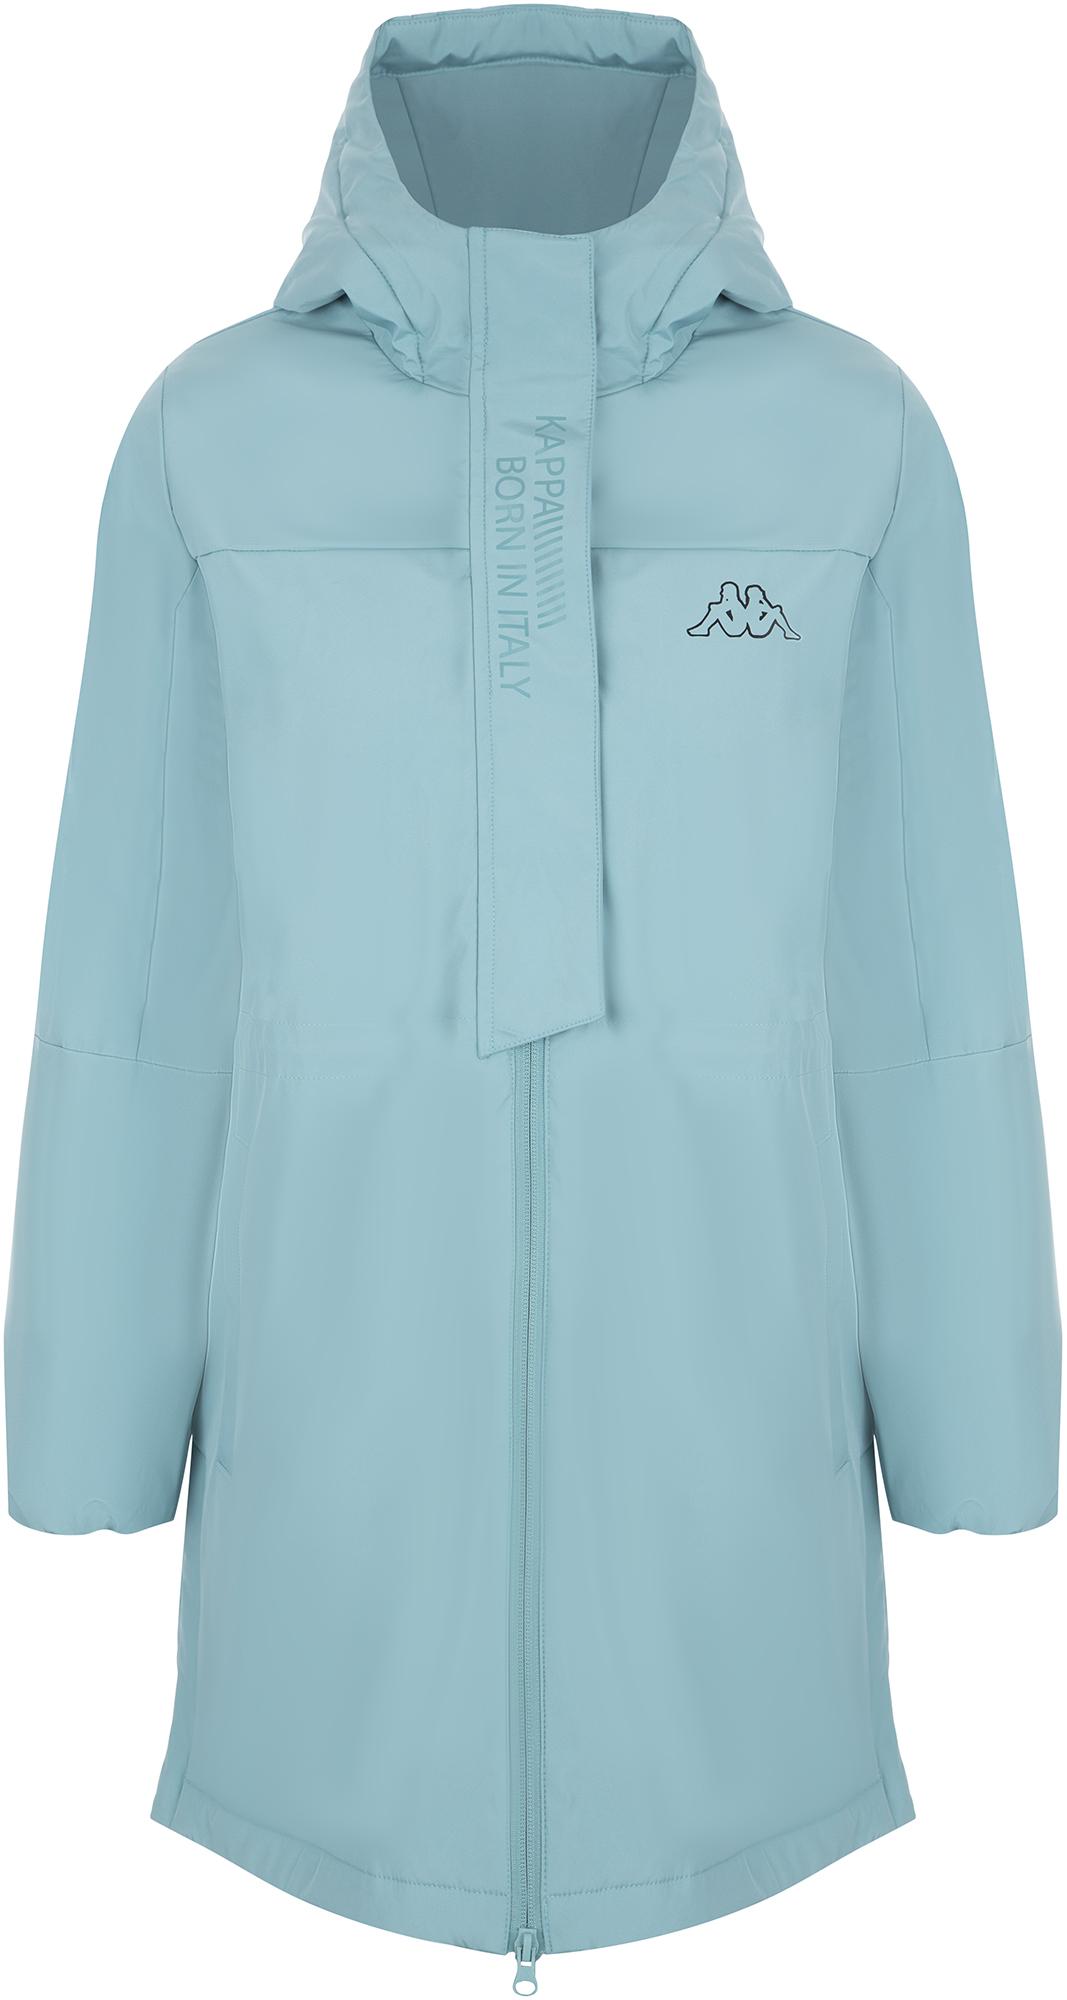 Kappa Куртка утепленная для девочек Kappa, размер 134